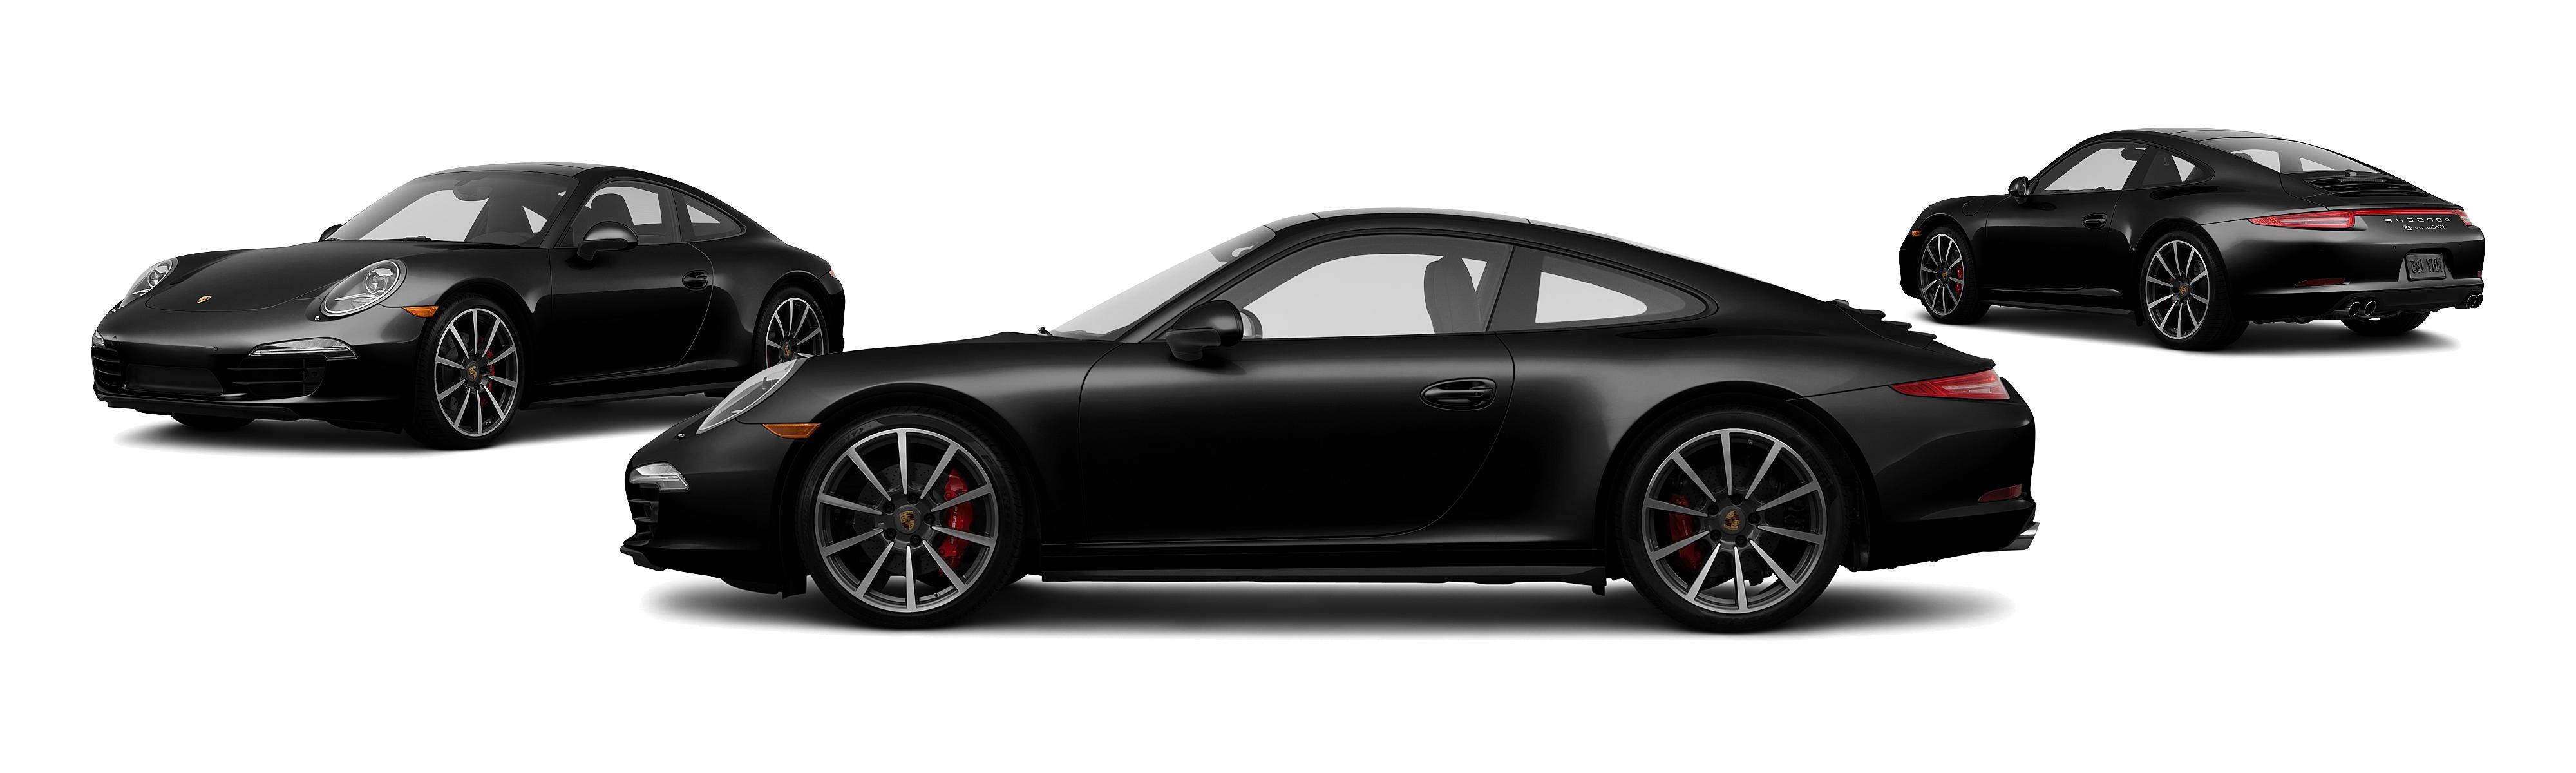 2014 porsche 911 awd carrera 4s 2dr coupe research groovecar - Porsche 911 2014 Black